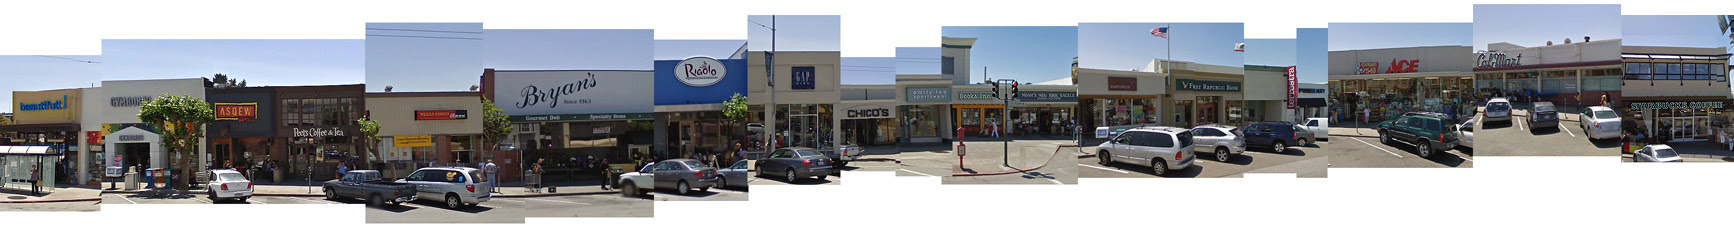 Laurel Village San Francisco Laurel Village Shopping - roblox shopping plaza